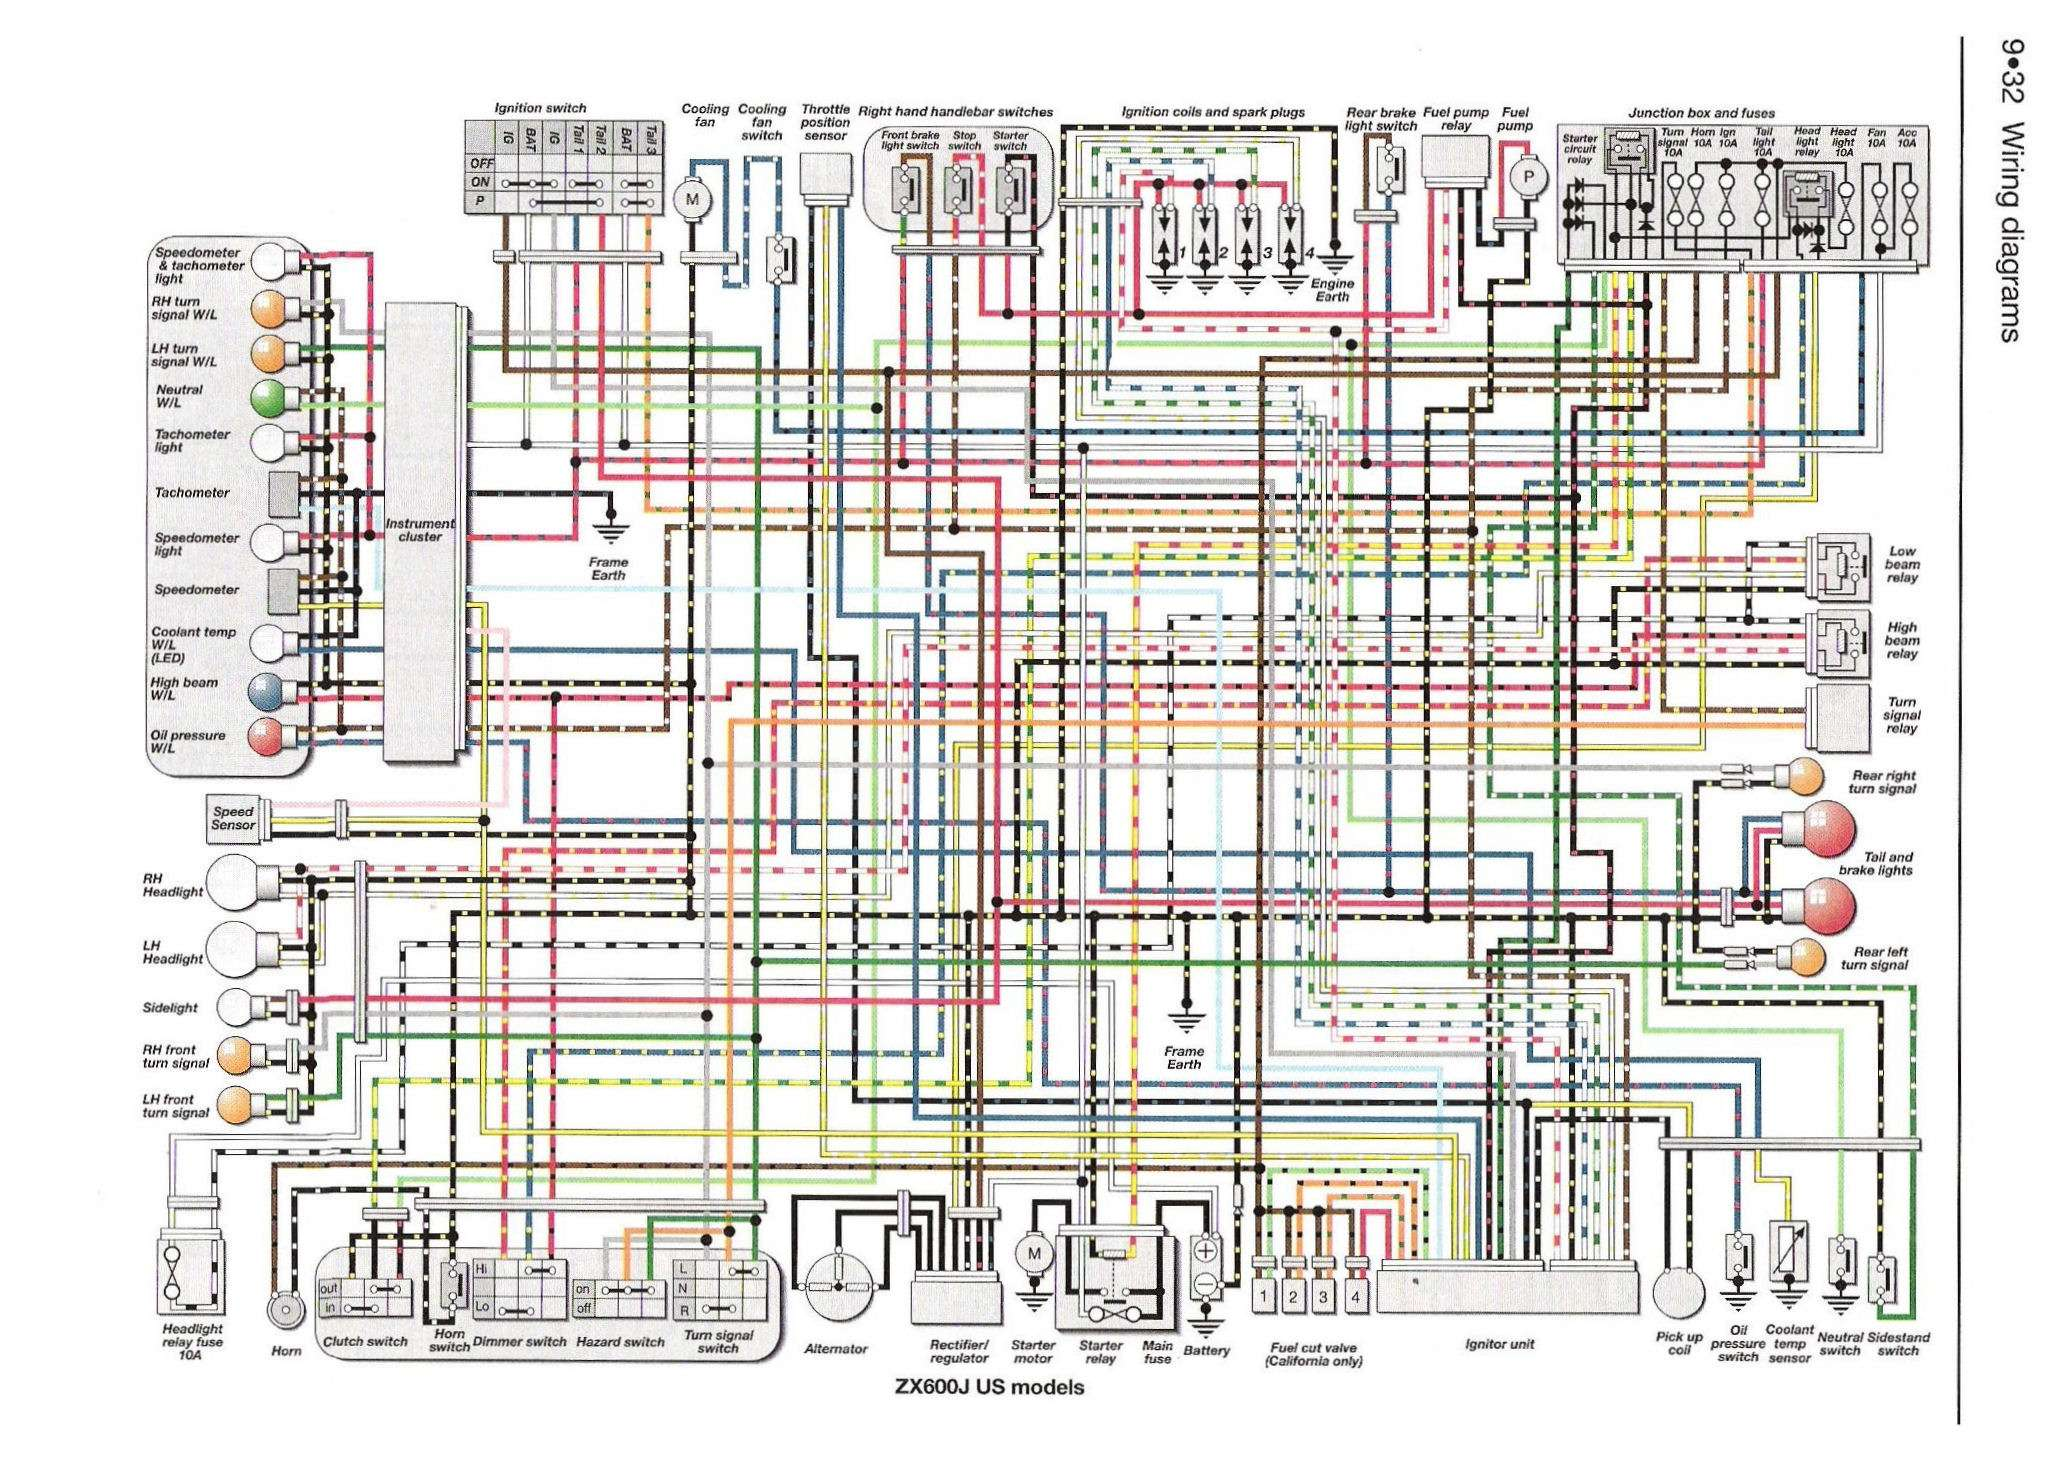 Km 9624 Wiring Diagram On 05 Zx10r Download Diagram